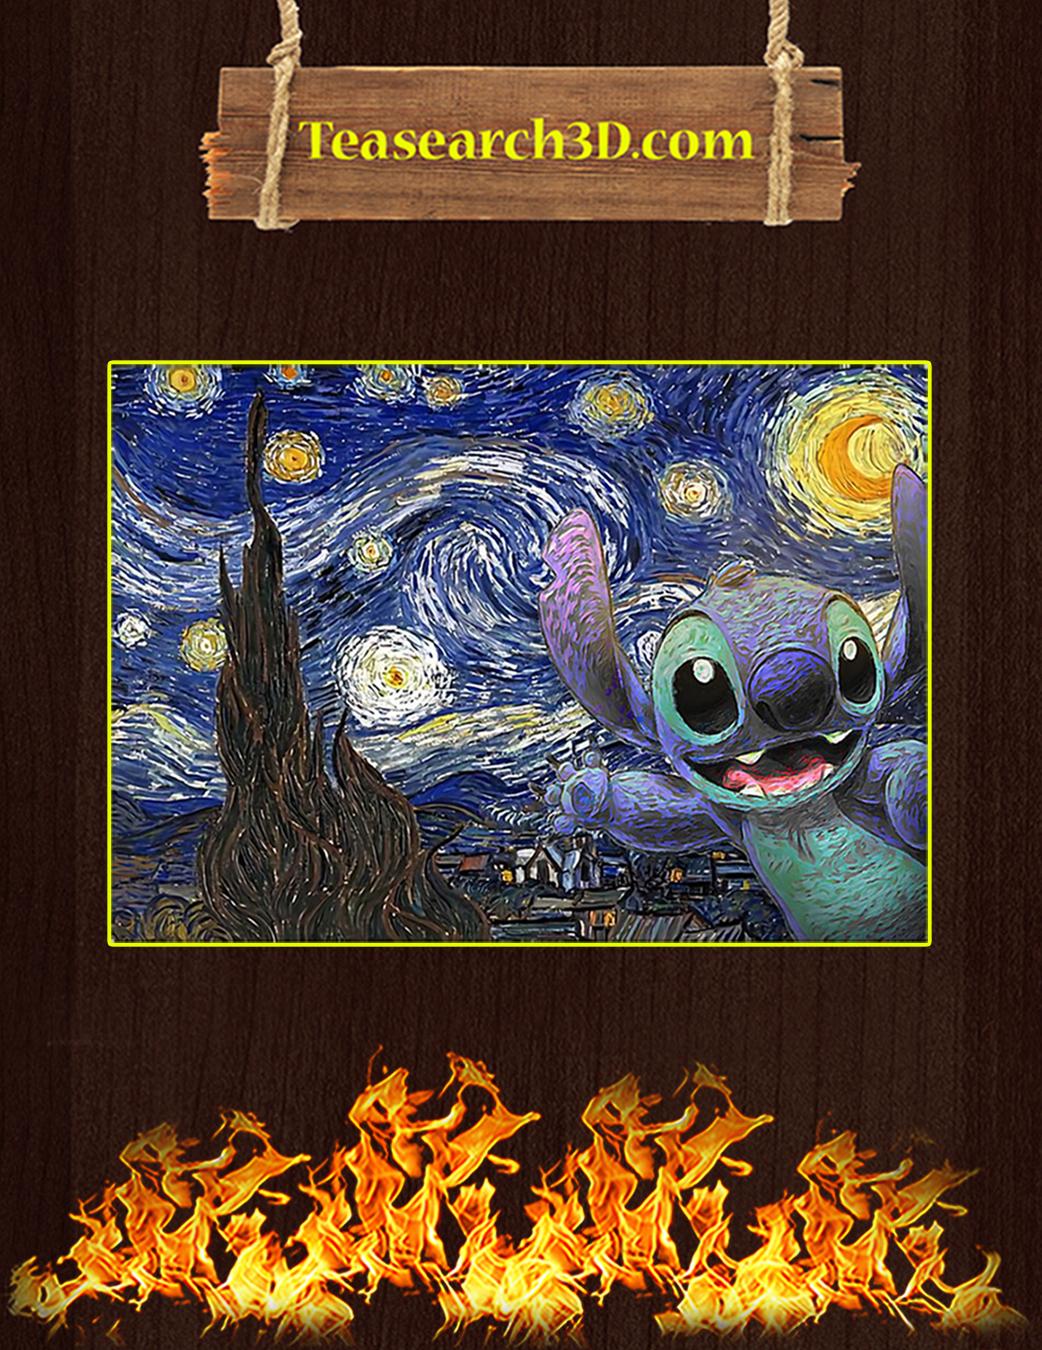 Stitch starry night poster A1